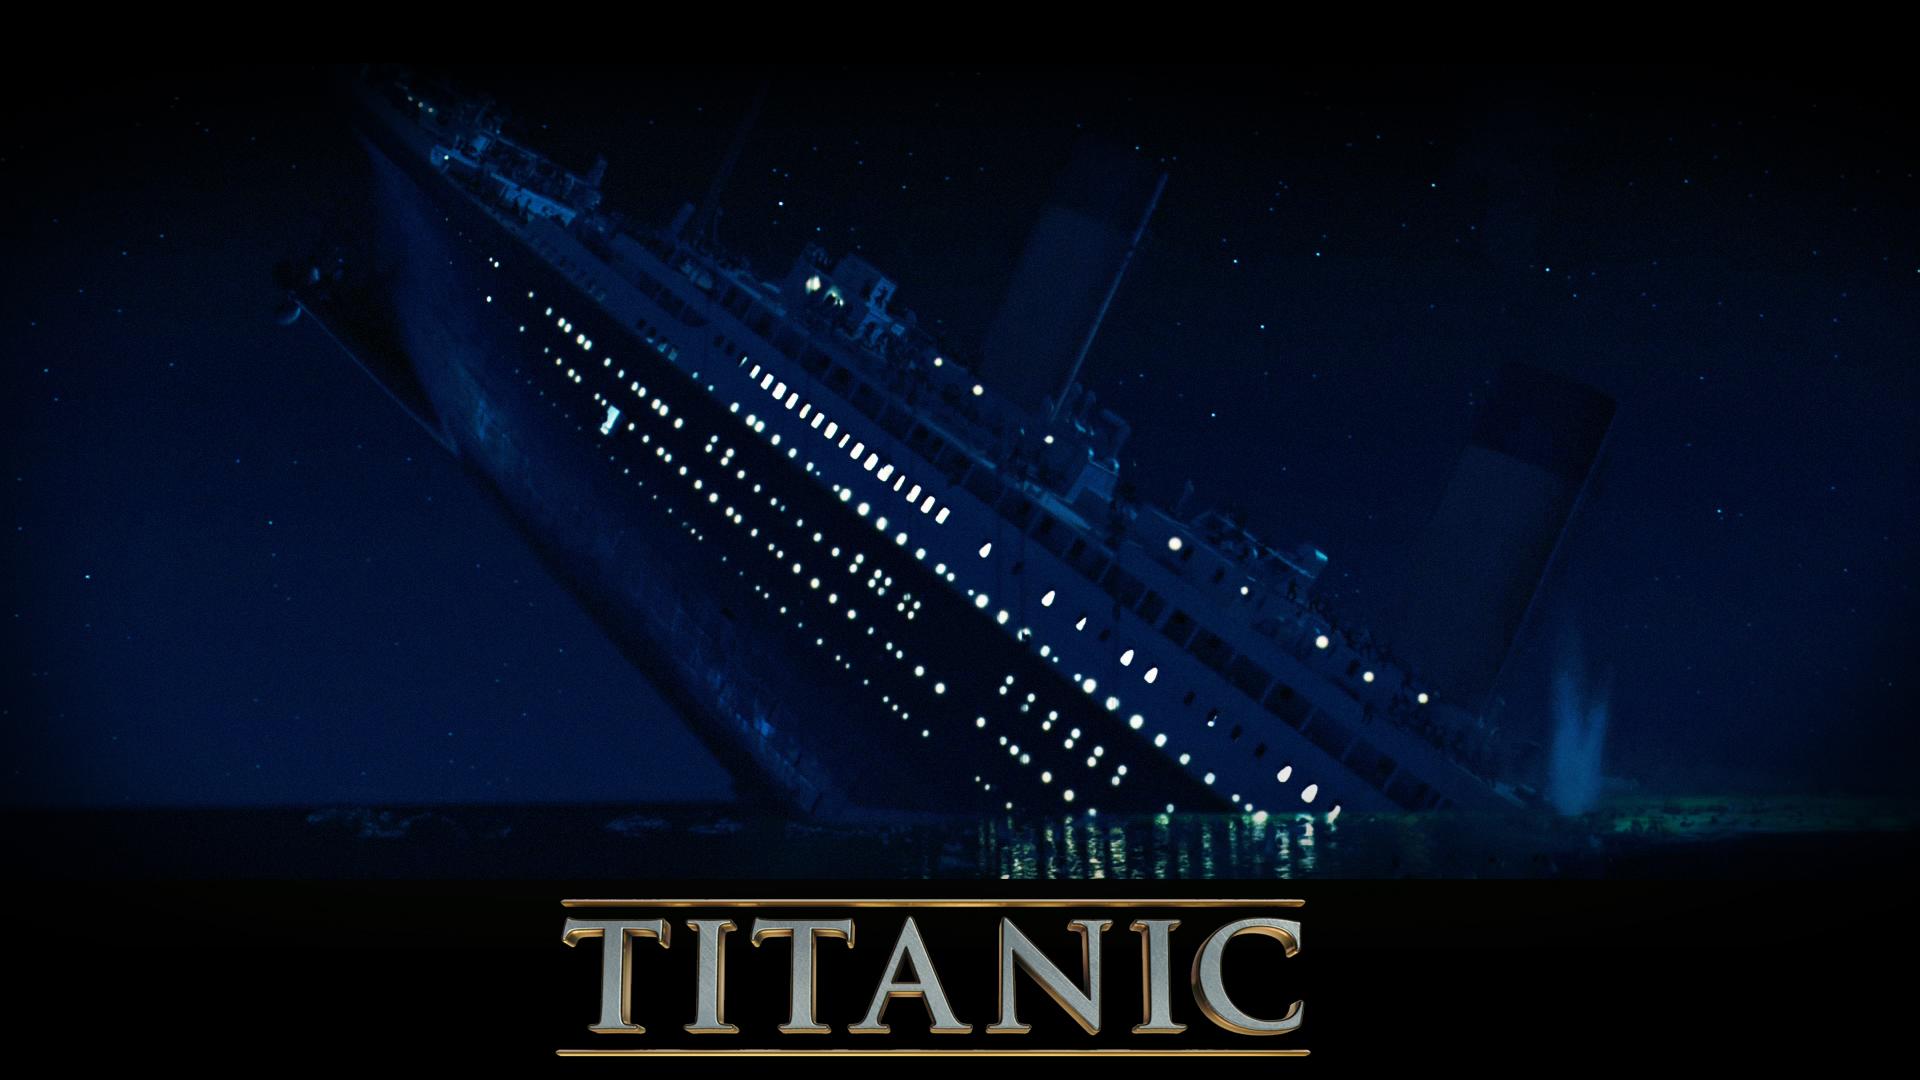 Titanic-in-3D-Wallpapers-1920x1080-12.jpg